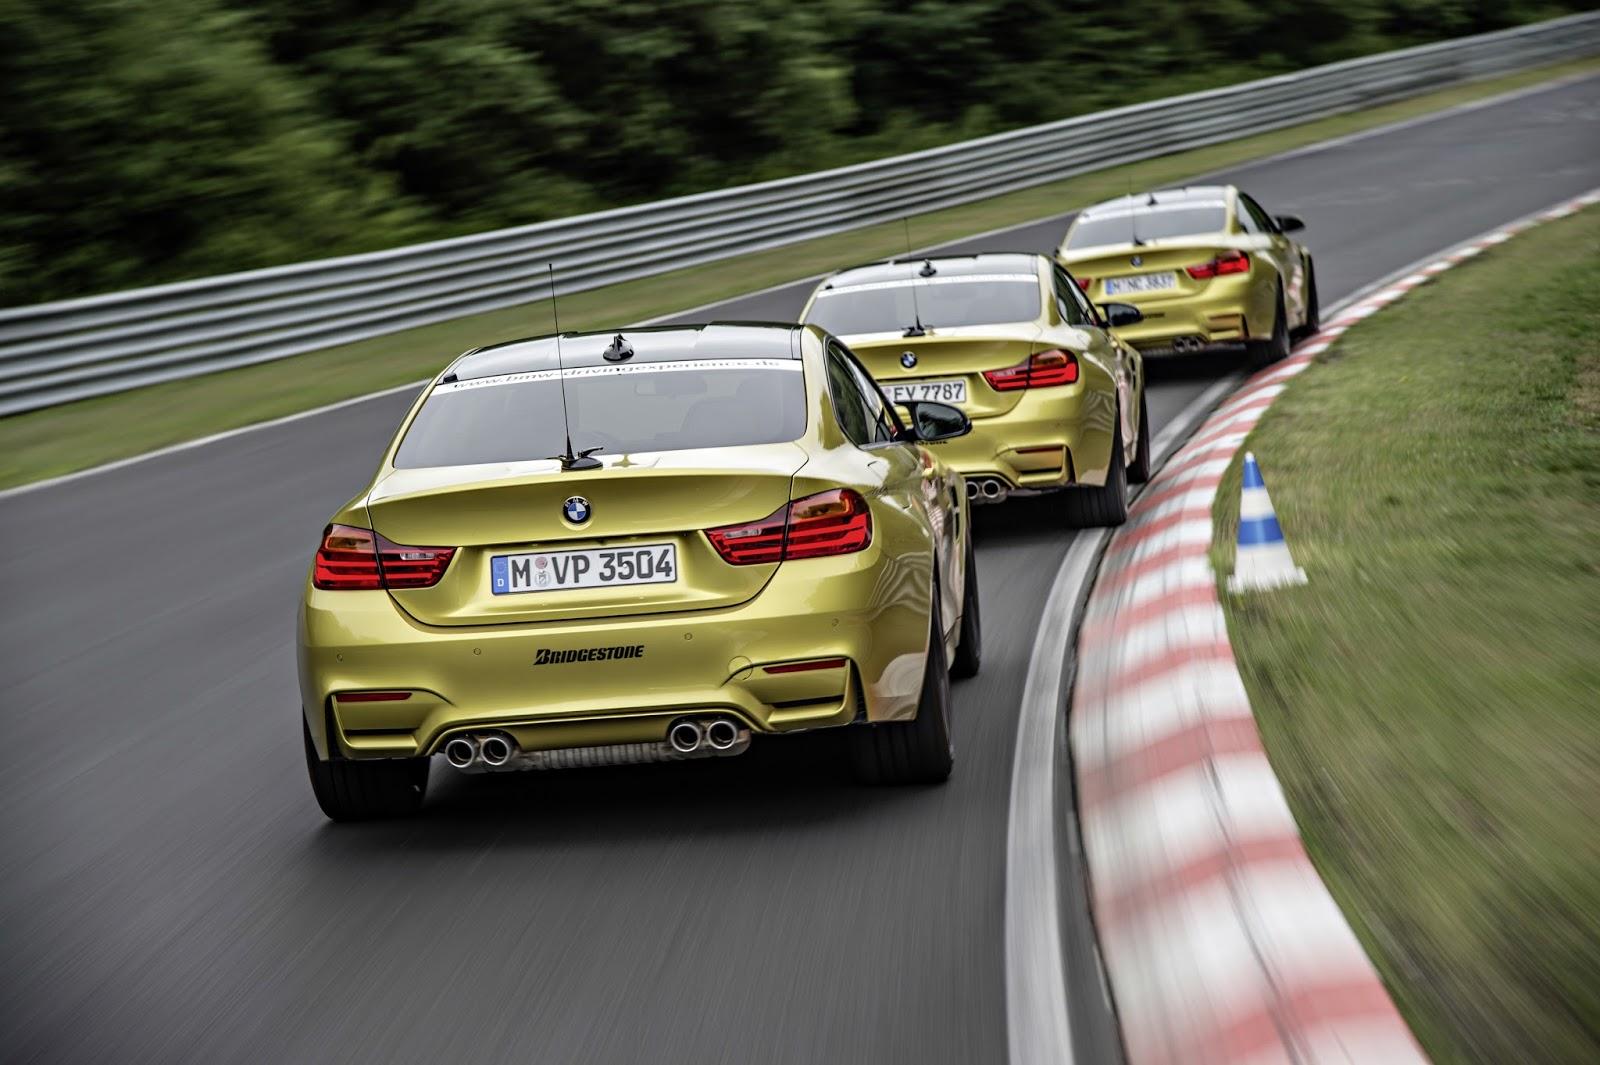 P90254188 highRes bmw mini driving ex 1 Γίνε καλύτερος οδηγός κάτω από όλες τις συνθήκες, με Bmw και Mini BMW, BMW i, BMW M, Driver, Driving Skills, Safety, οδήγηση, οδηγοί